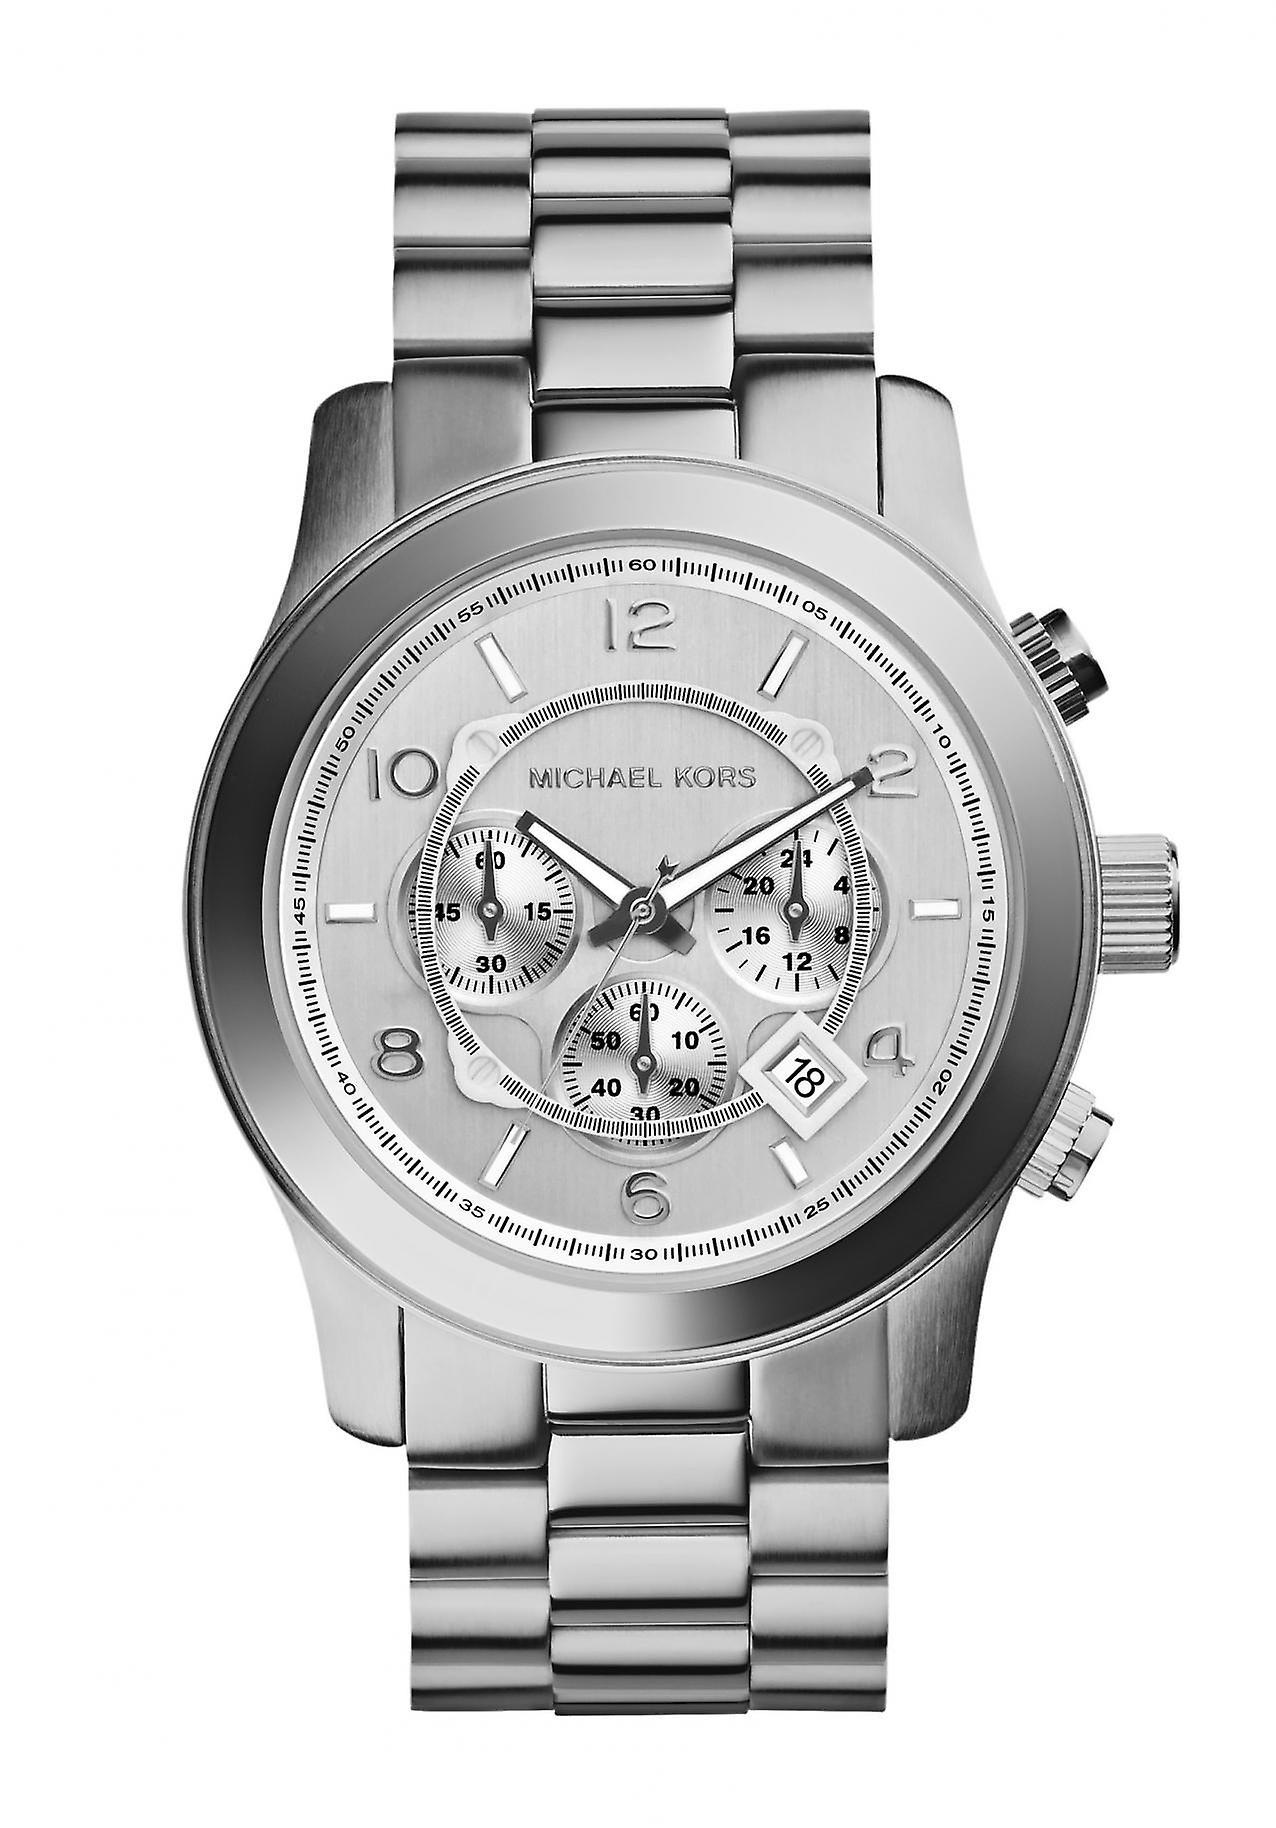 Michael Kors Herrenchronograph start-en landingsbaan (MK8086)